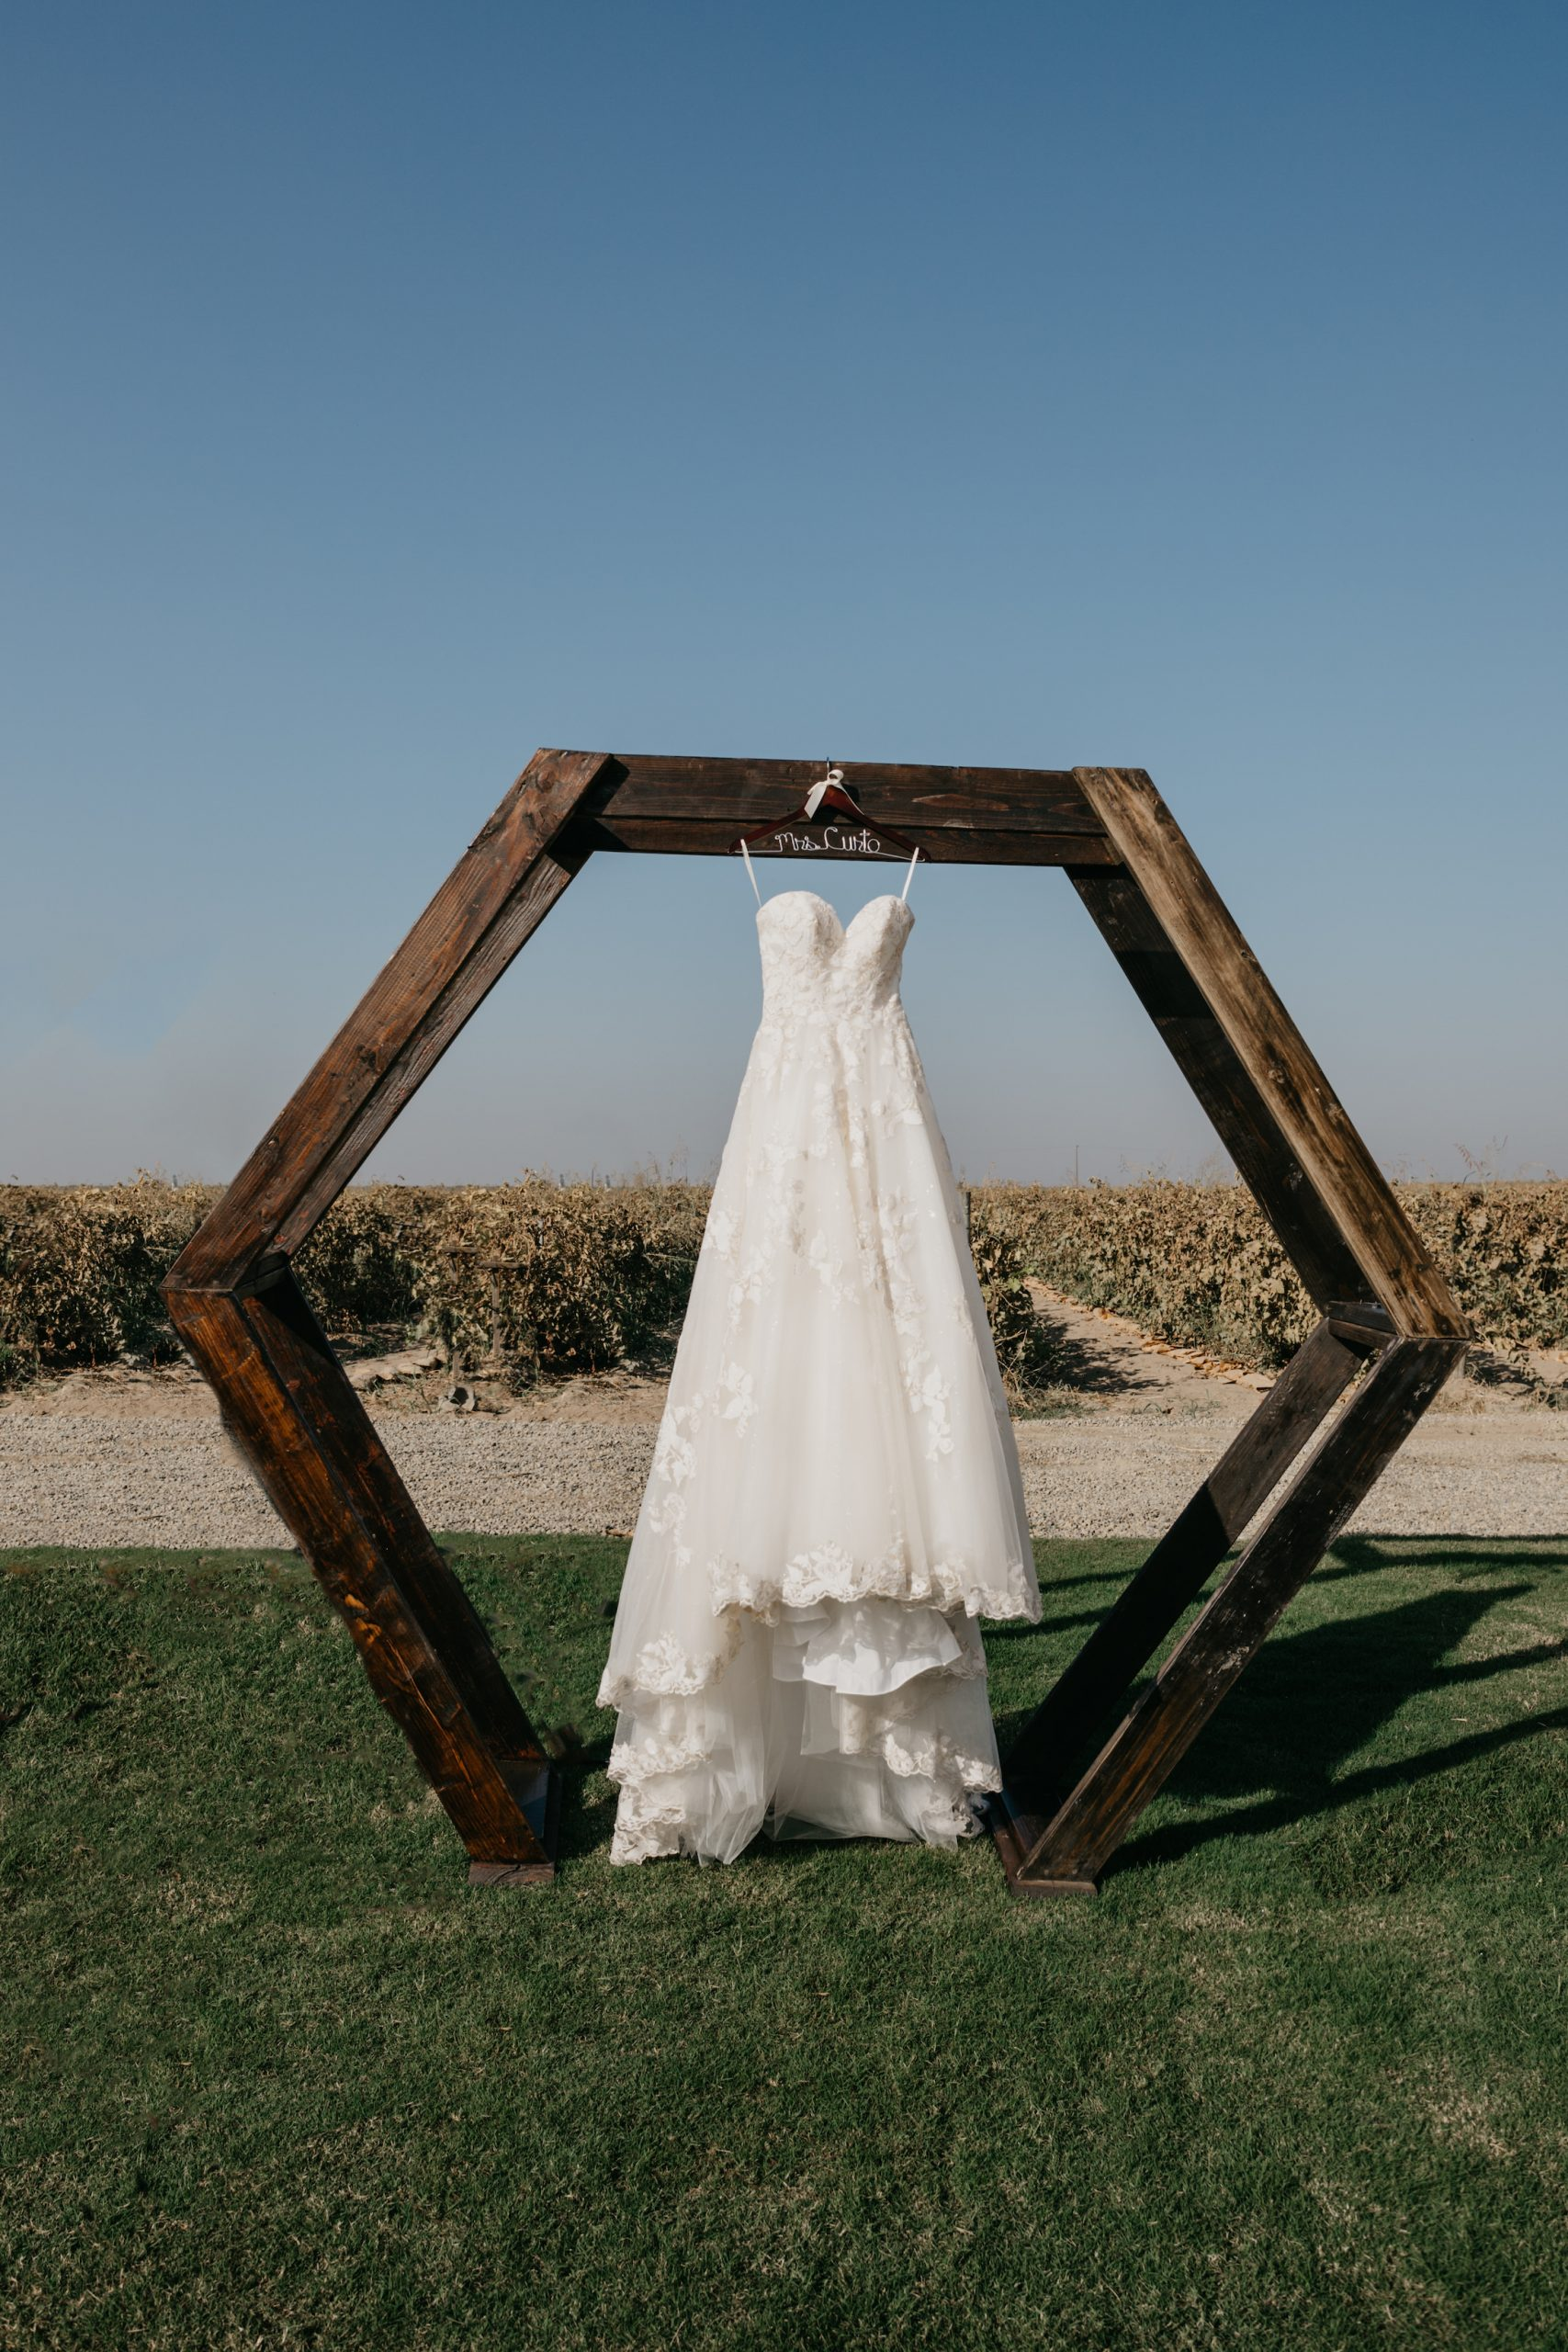 Casablanca Wedding Dress in Evanelle Vineyards Wedding, image by Fatima Elreda Photo